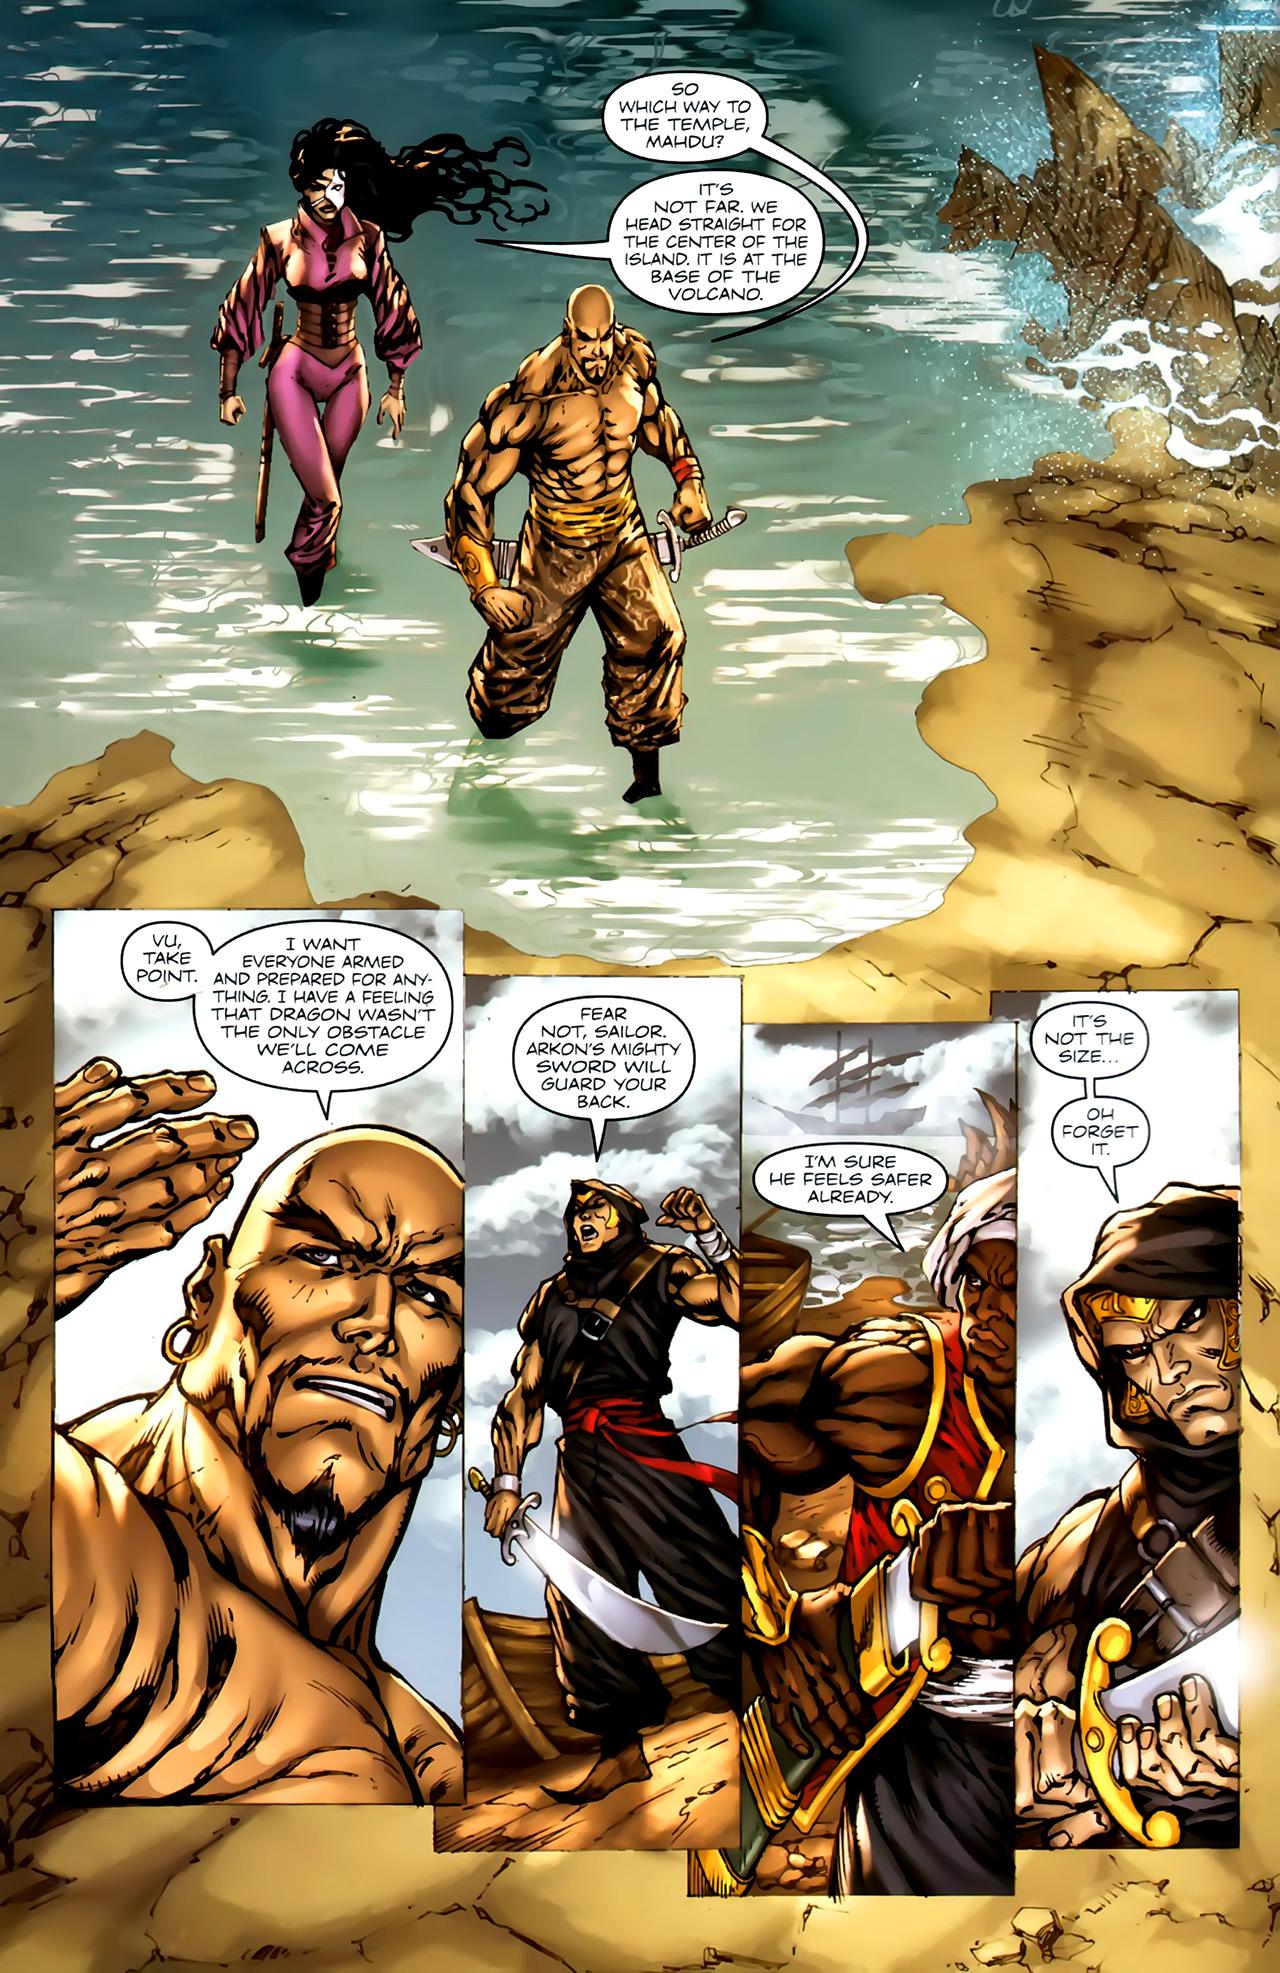 Read online 1001 Arabian Nights: The Adventures of Sinbad comic -  Issue #4 - 6